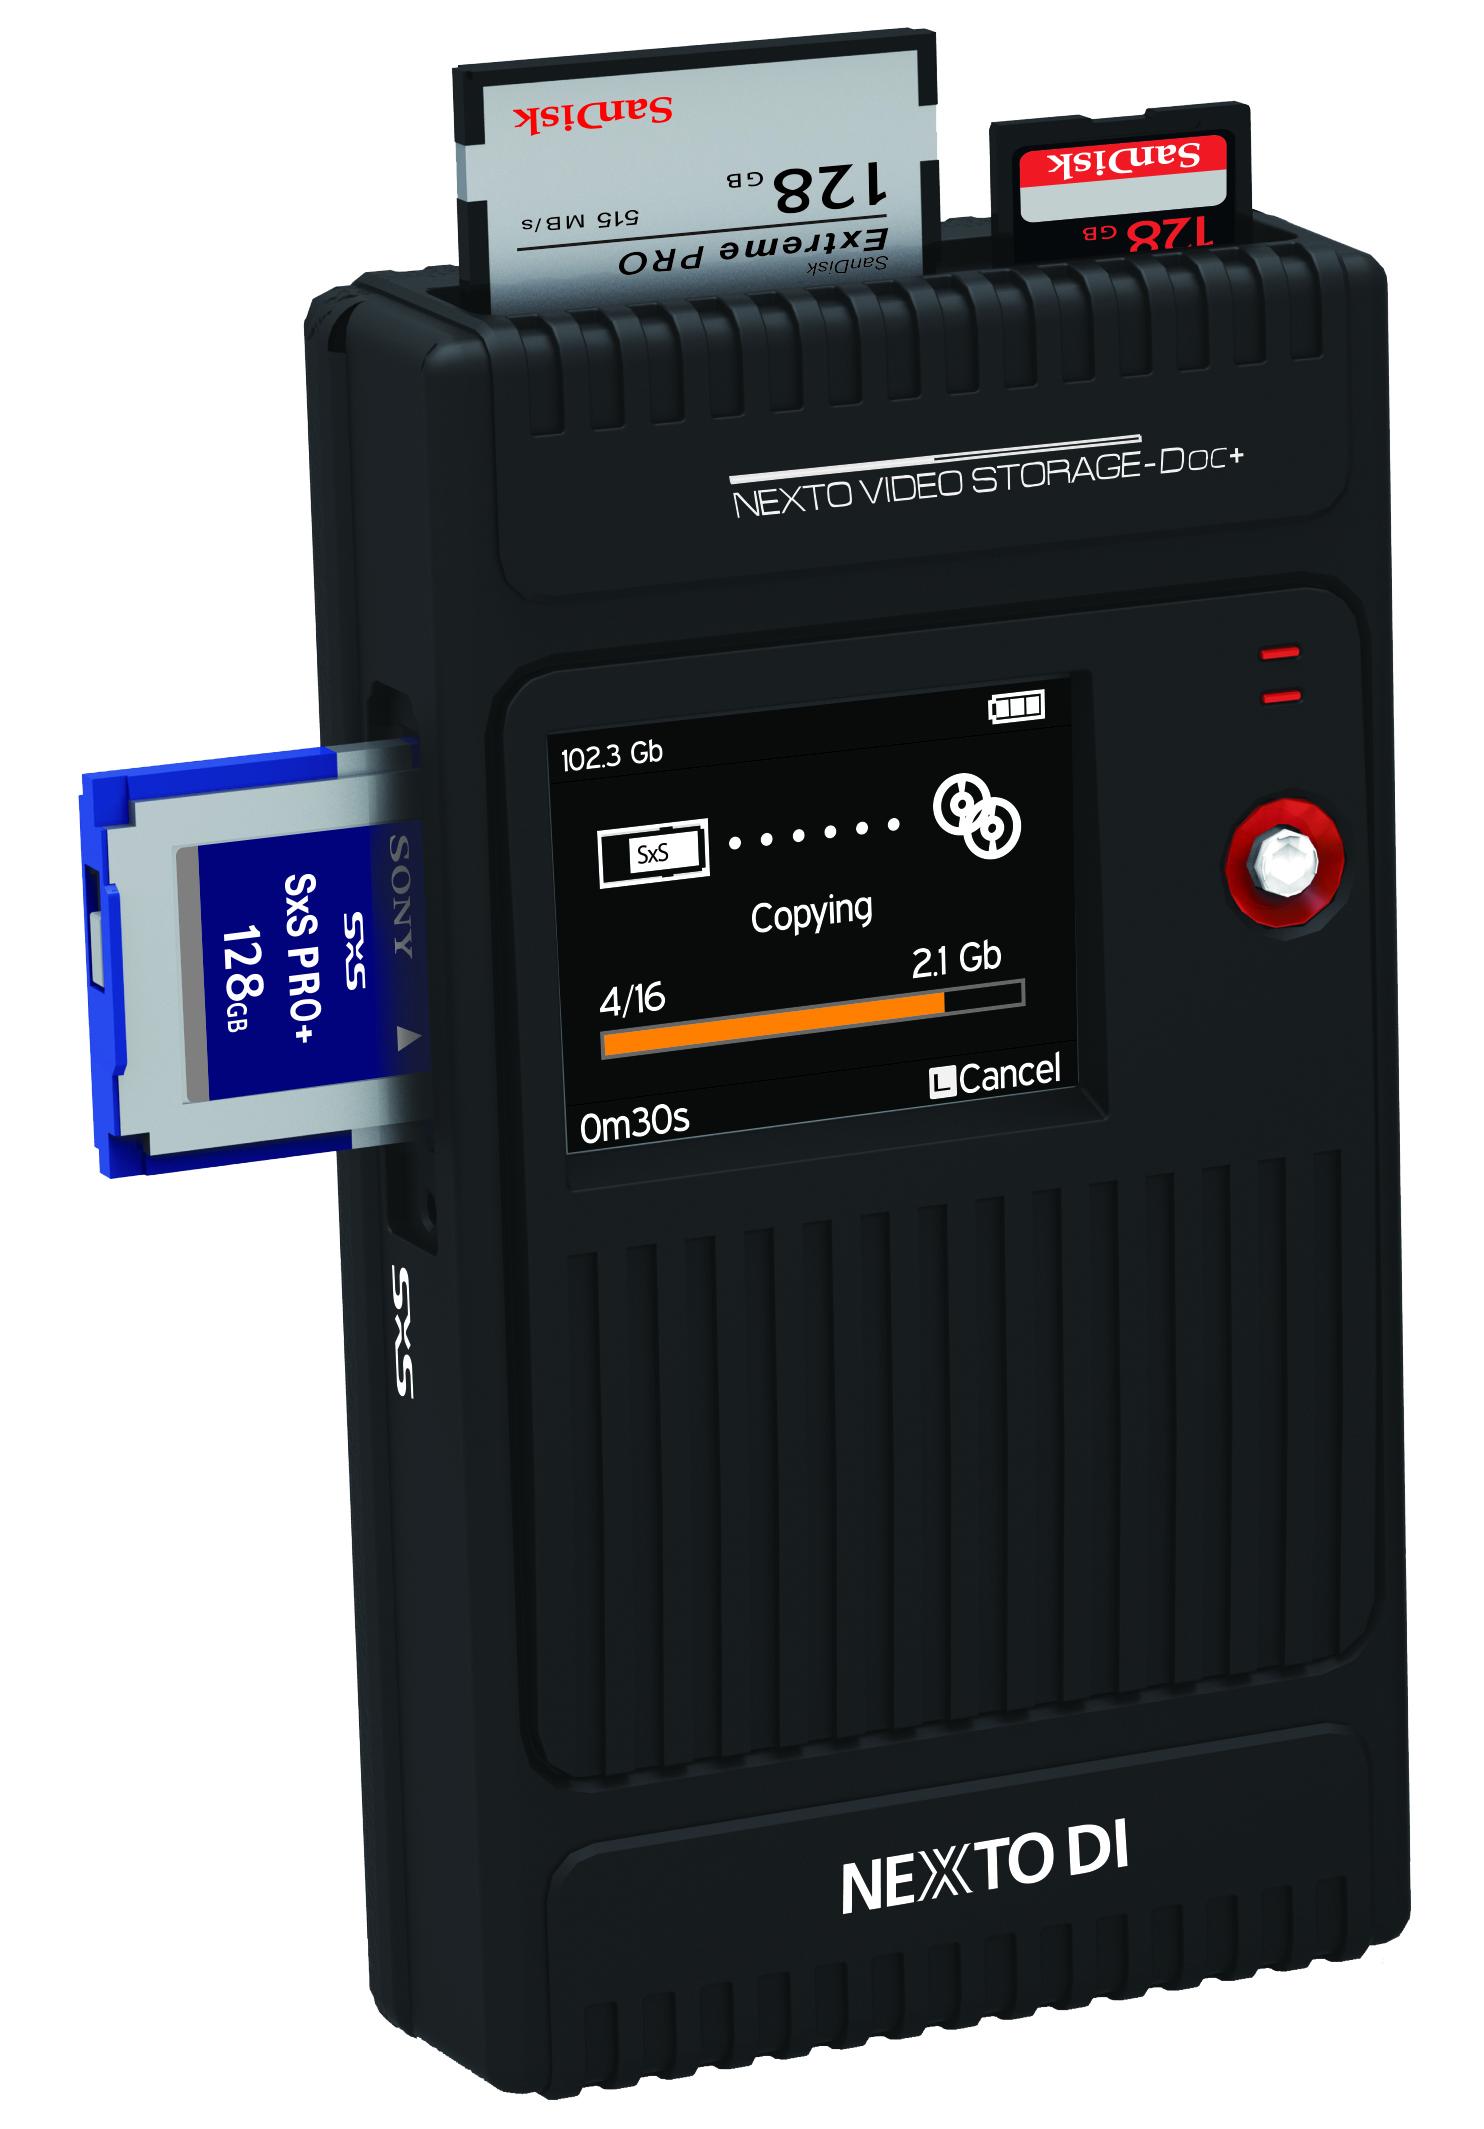 IDXがNEXTO DIのメモリーカードバックアップ装置を販売開始